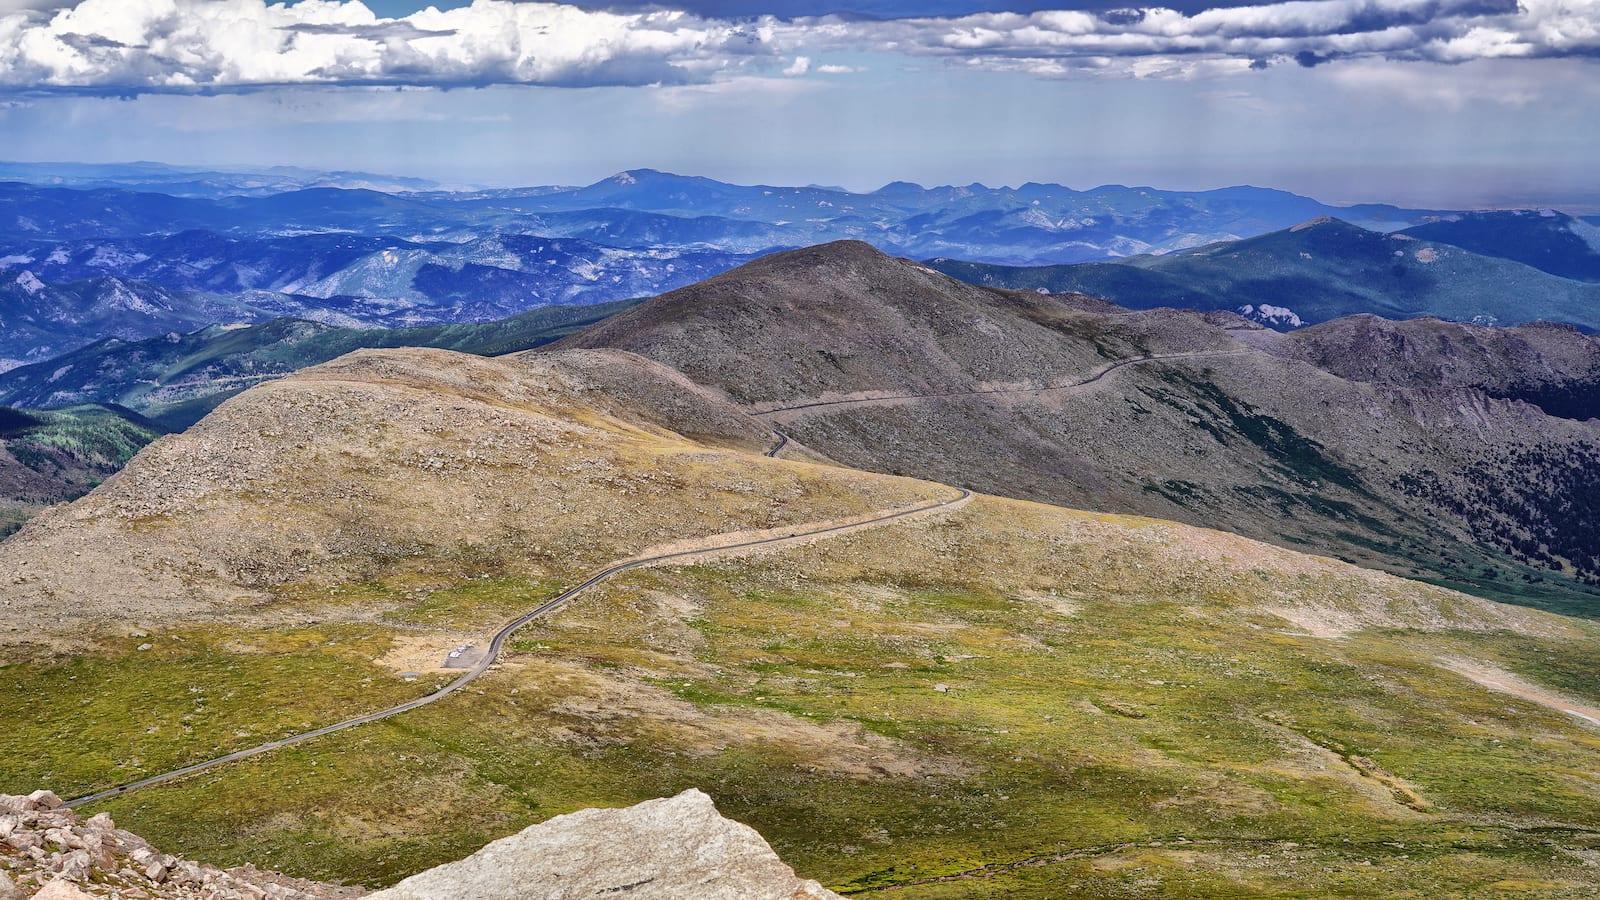 Overlooking Mount Evans Road near Evergreen Colorado